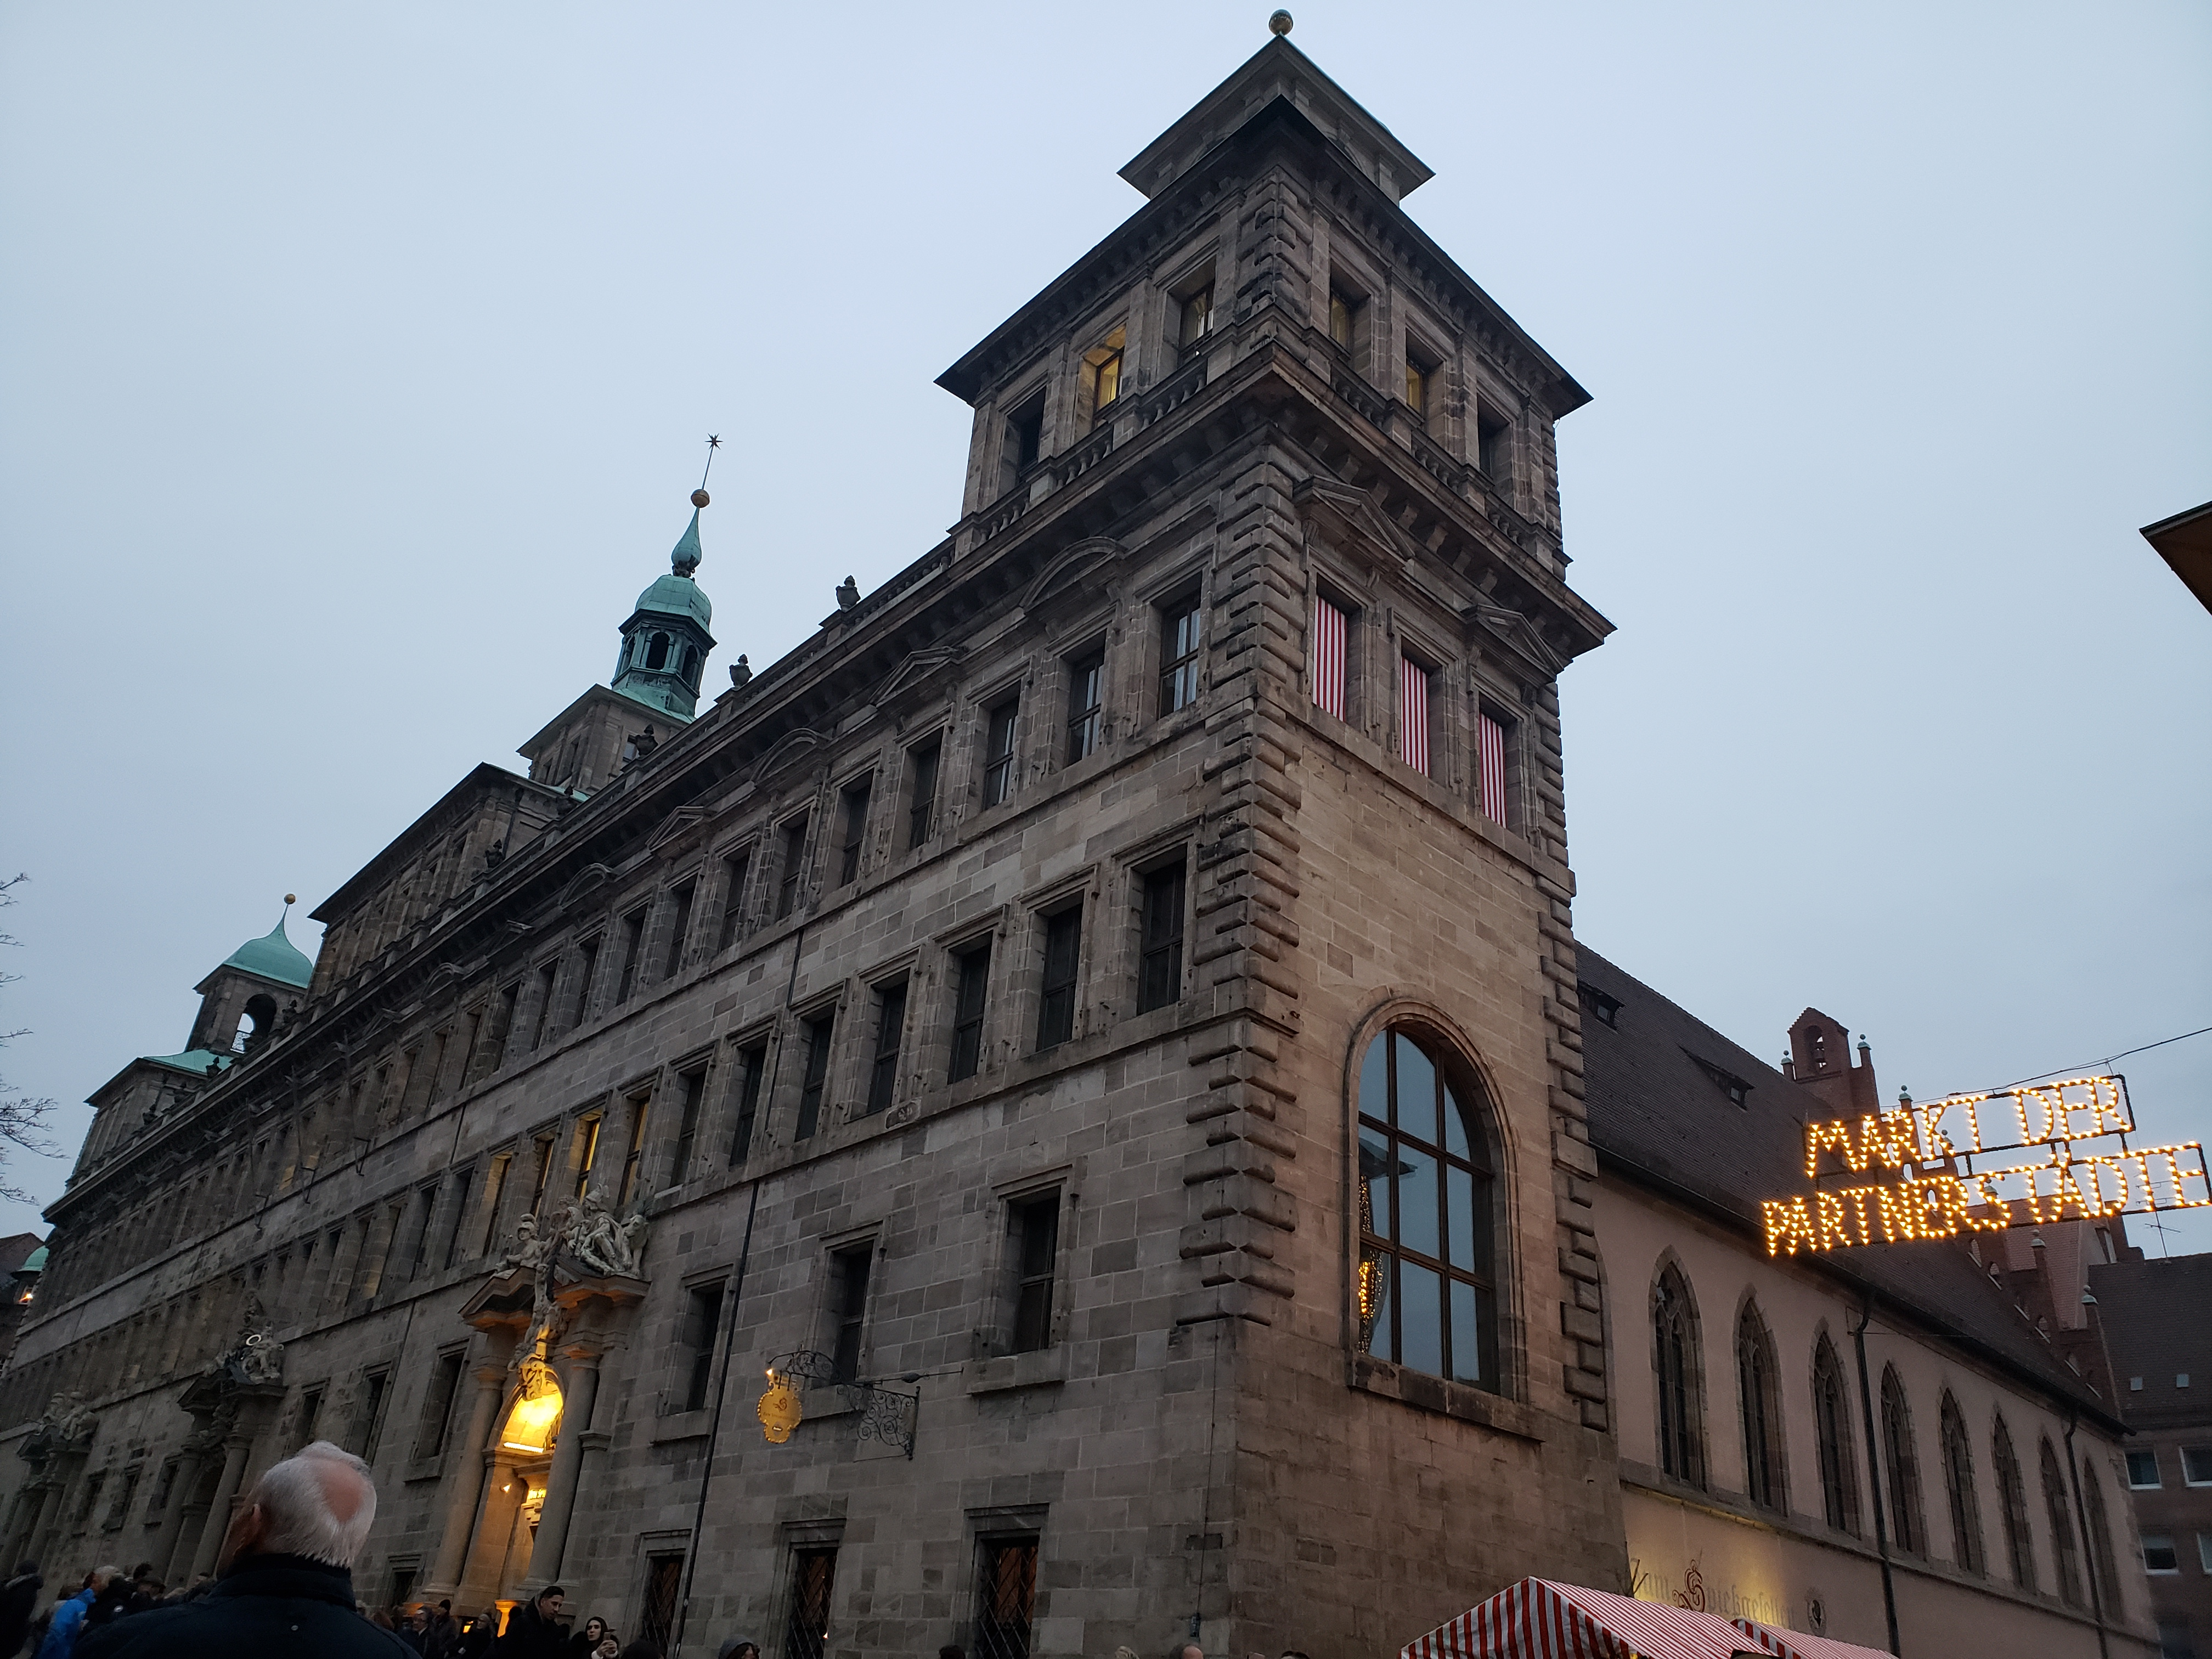 "A large, old building with a string of lights reading ""Market der Partnerstadte""."